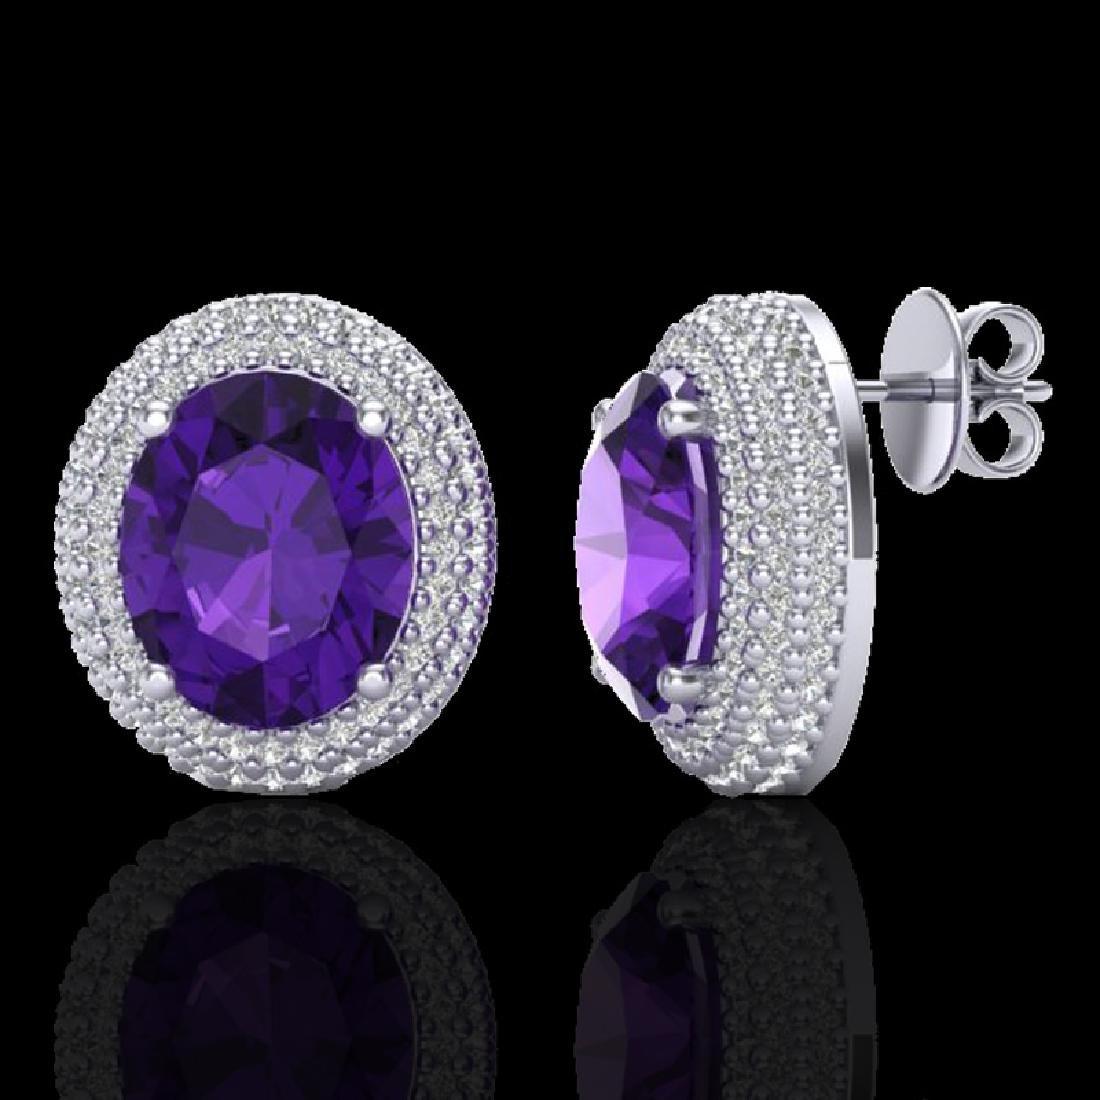 8 CTW Amethyst & Micro Pave VS/SI Diamond Earrings 18K - 2